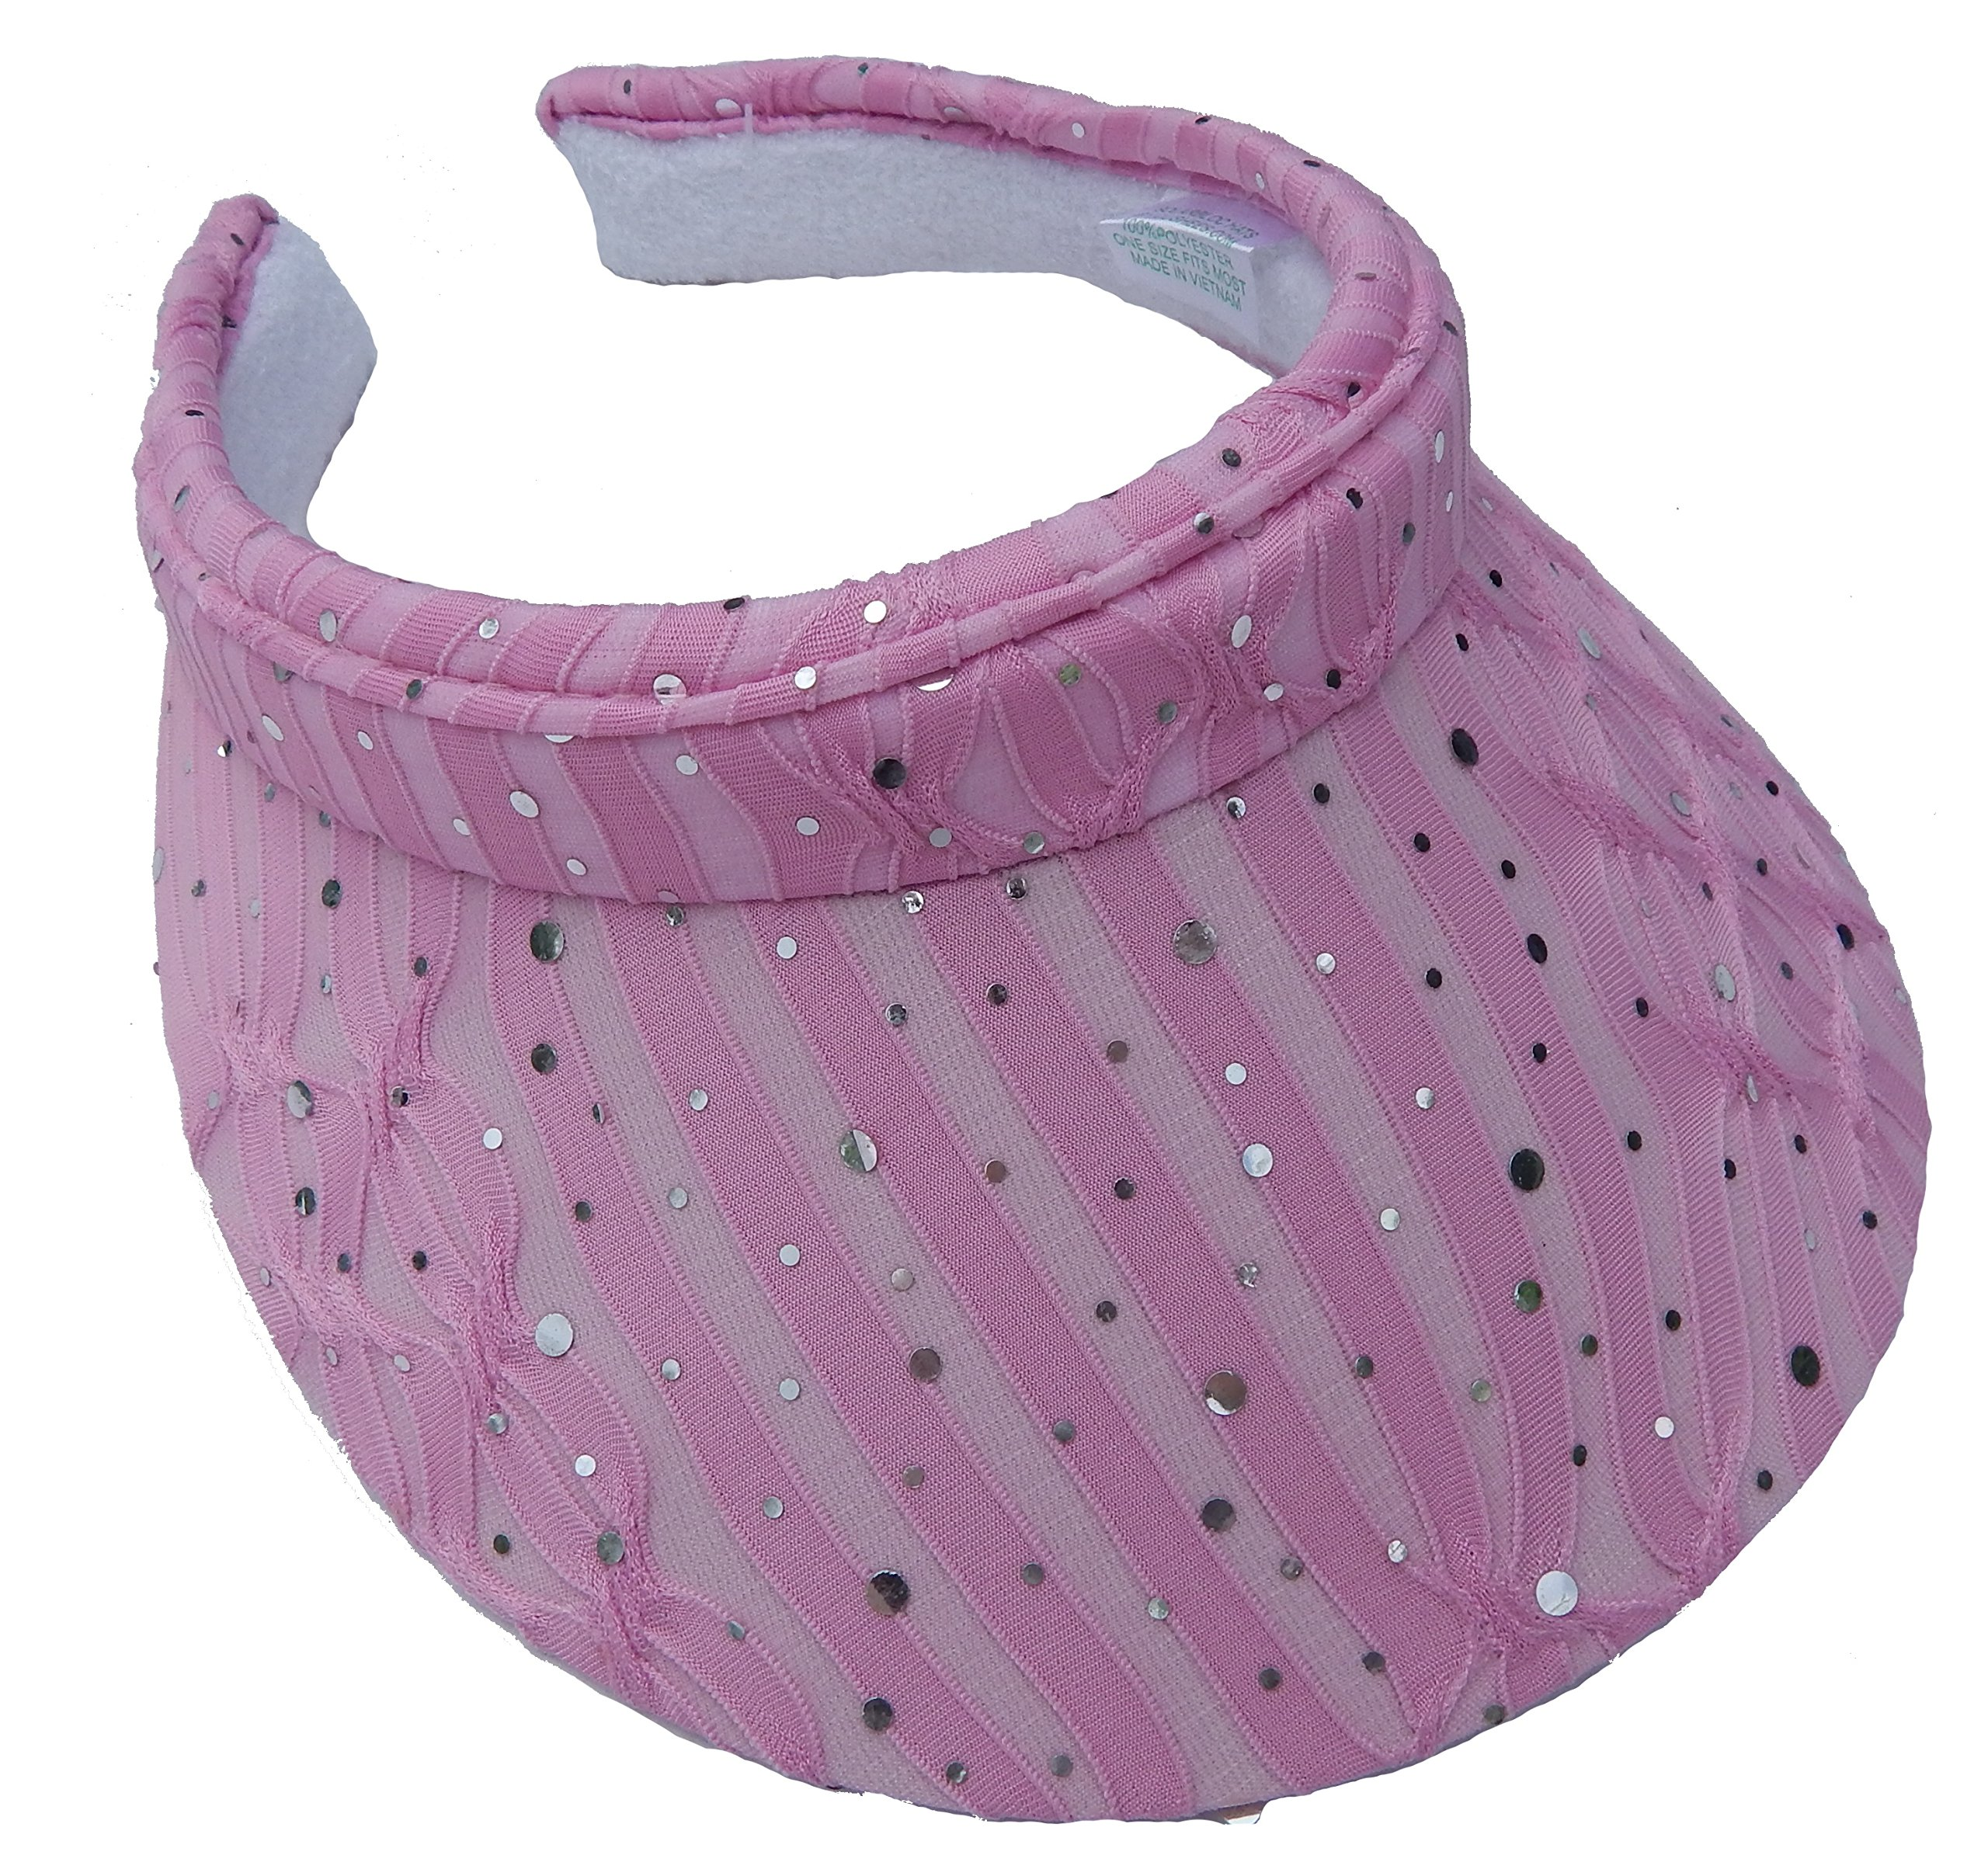 Cushees Sparkle Clip-on Visor (Pink) 634